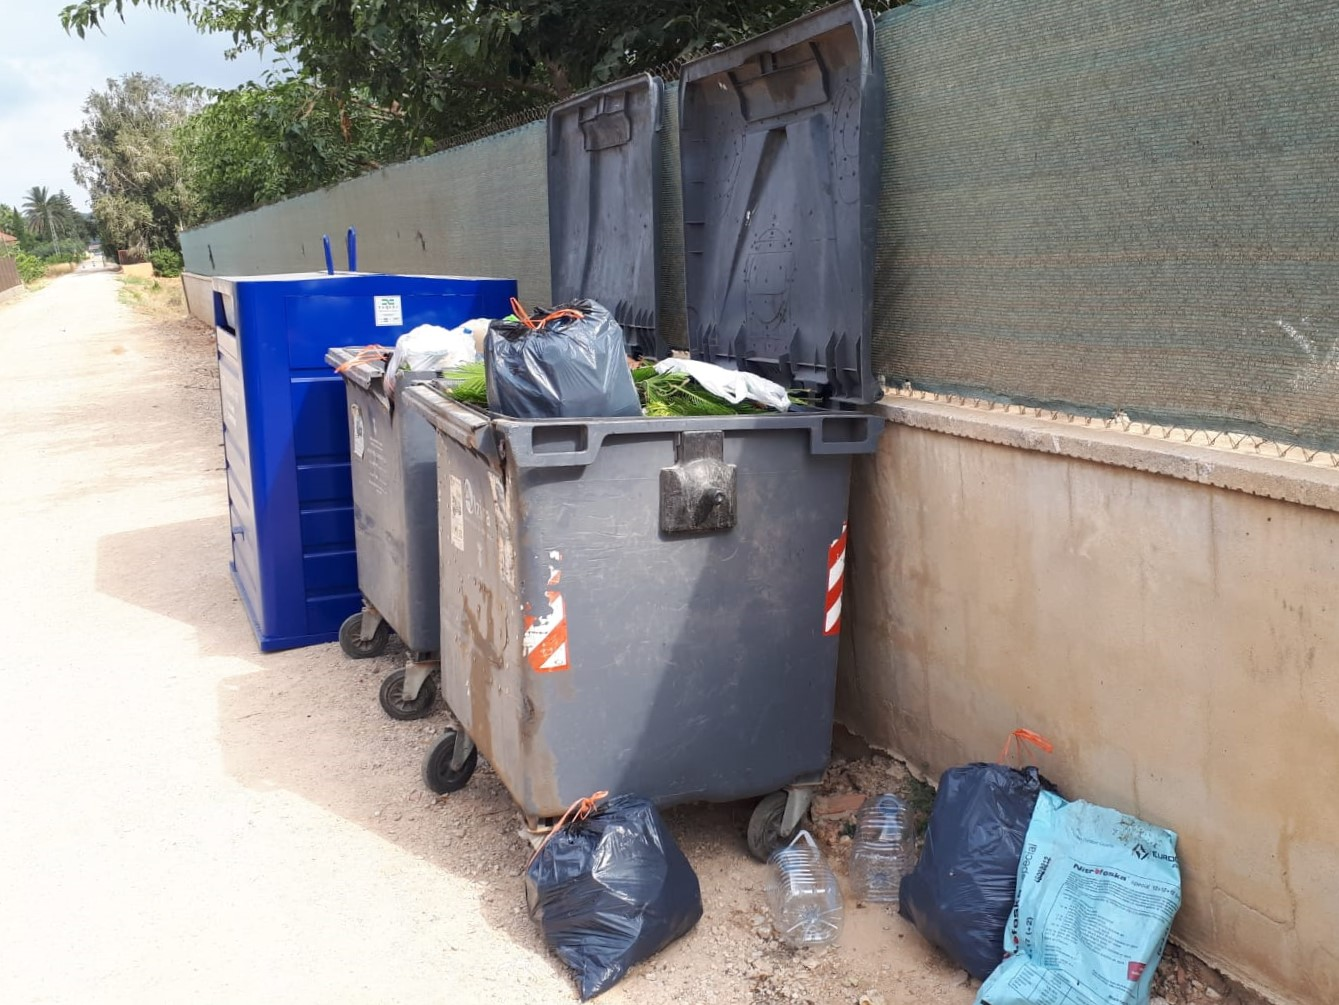 La Barraca contenidors 2 - Alzira Radio notícies d'Alzira